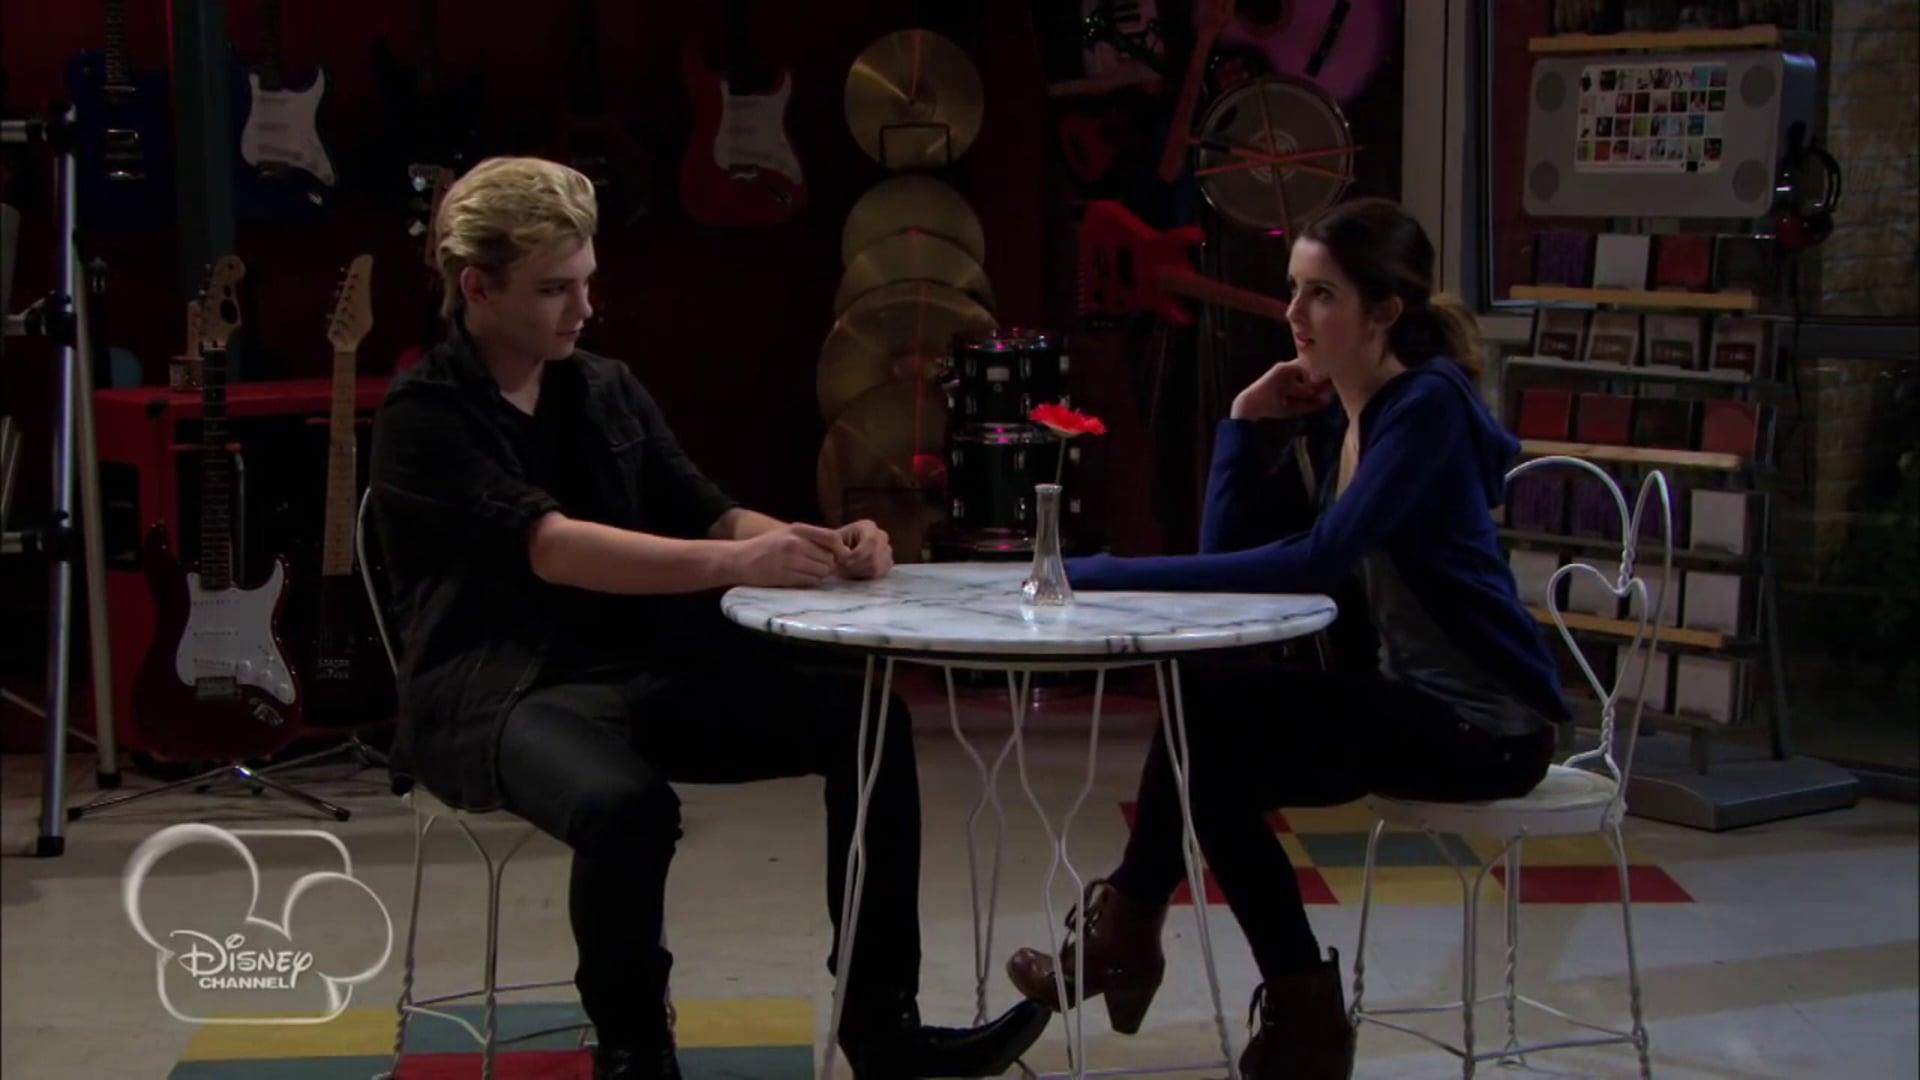 Austin & Ally - The 2nd Kiss/Vampires